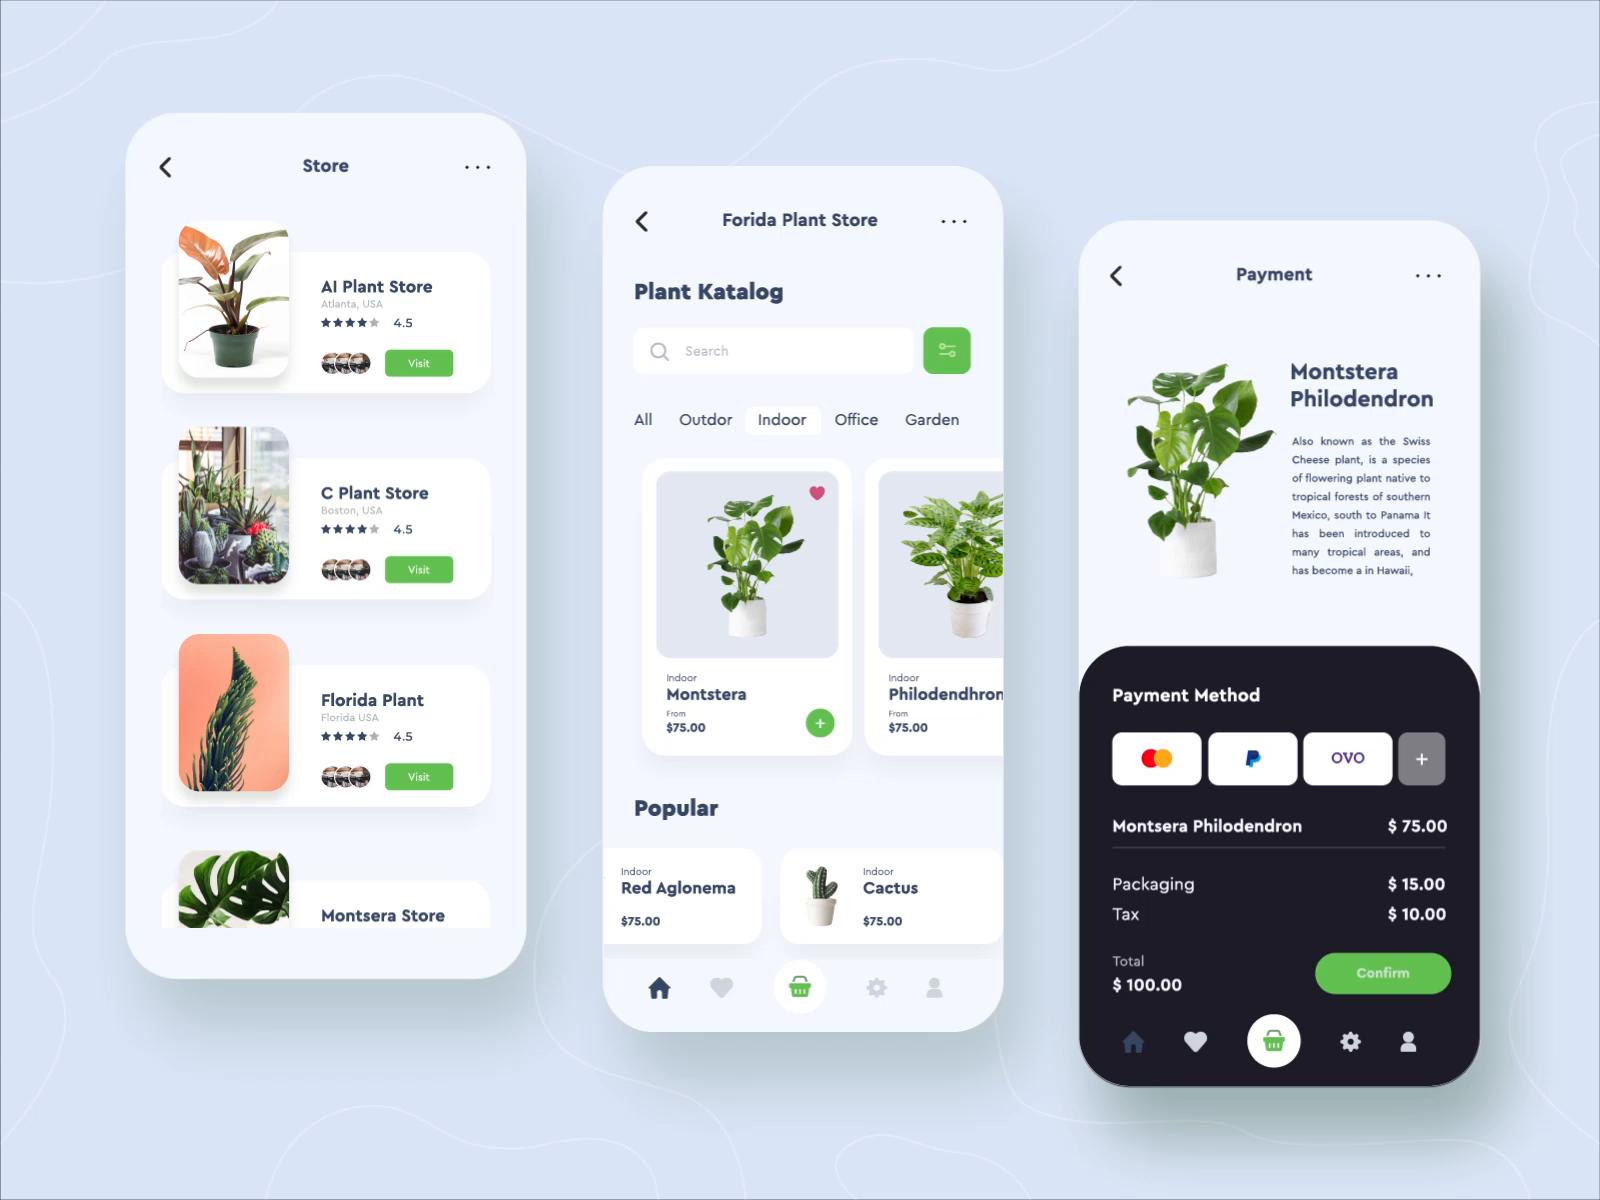 Online Plant Shop Mobile App Design By Permadi Satria Dewanto Desain App Desain Aplikasi Android Desain Ux